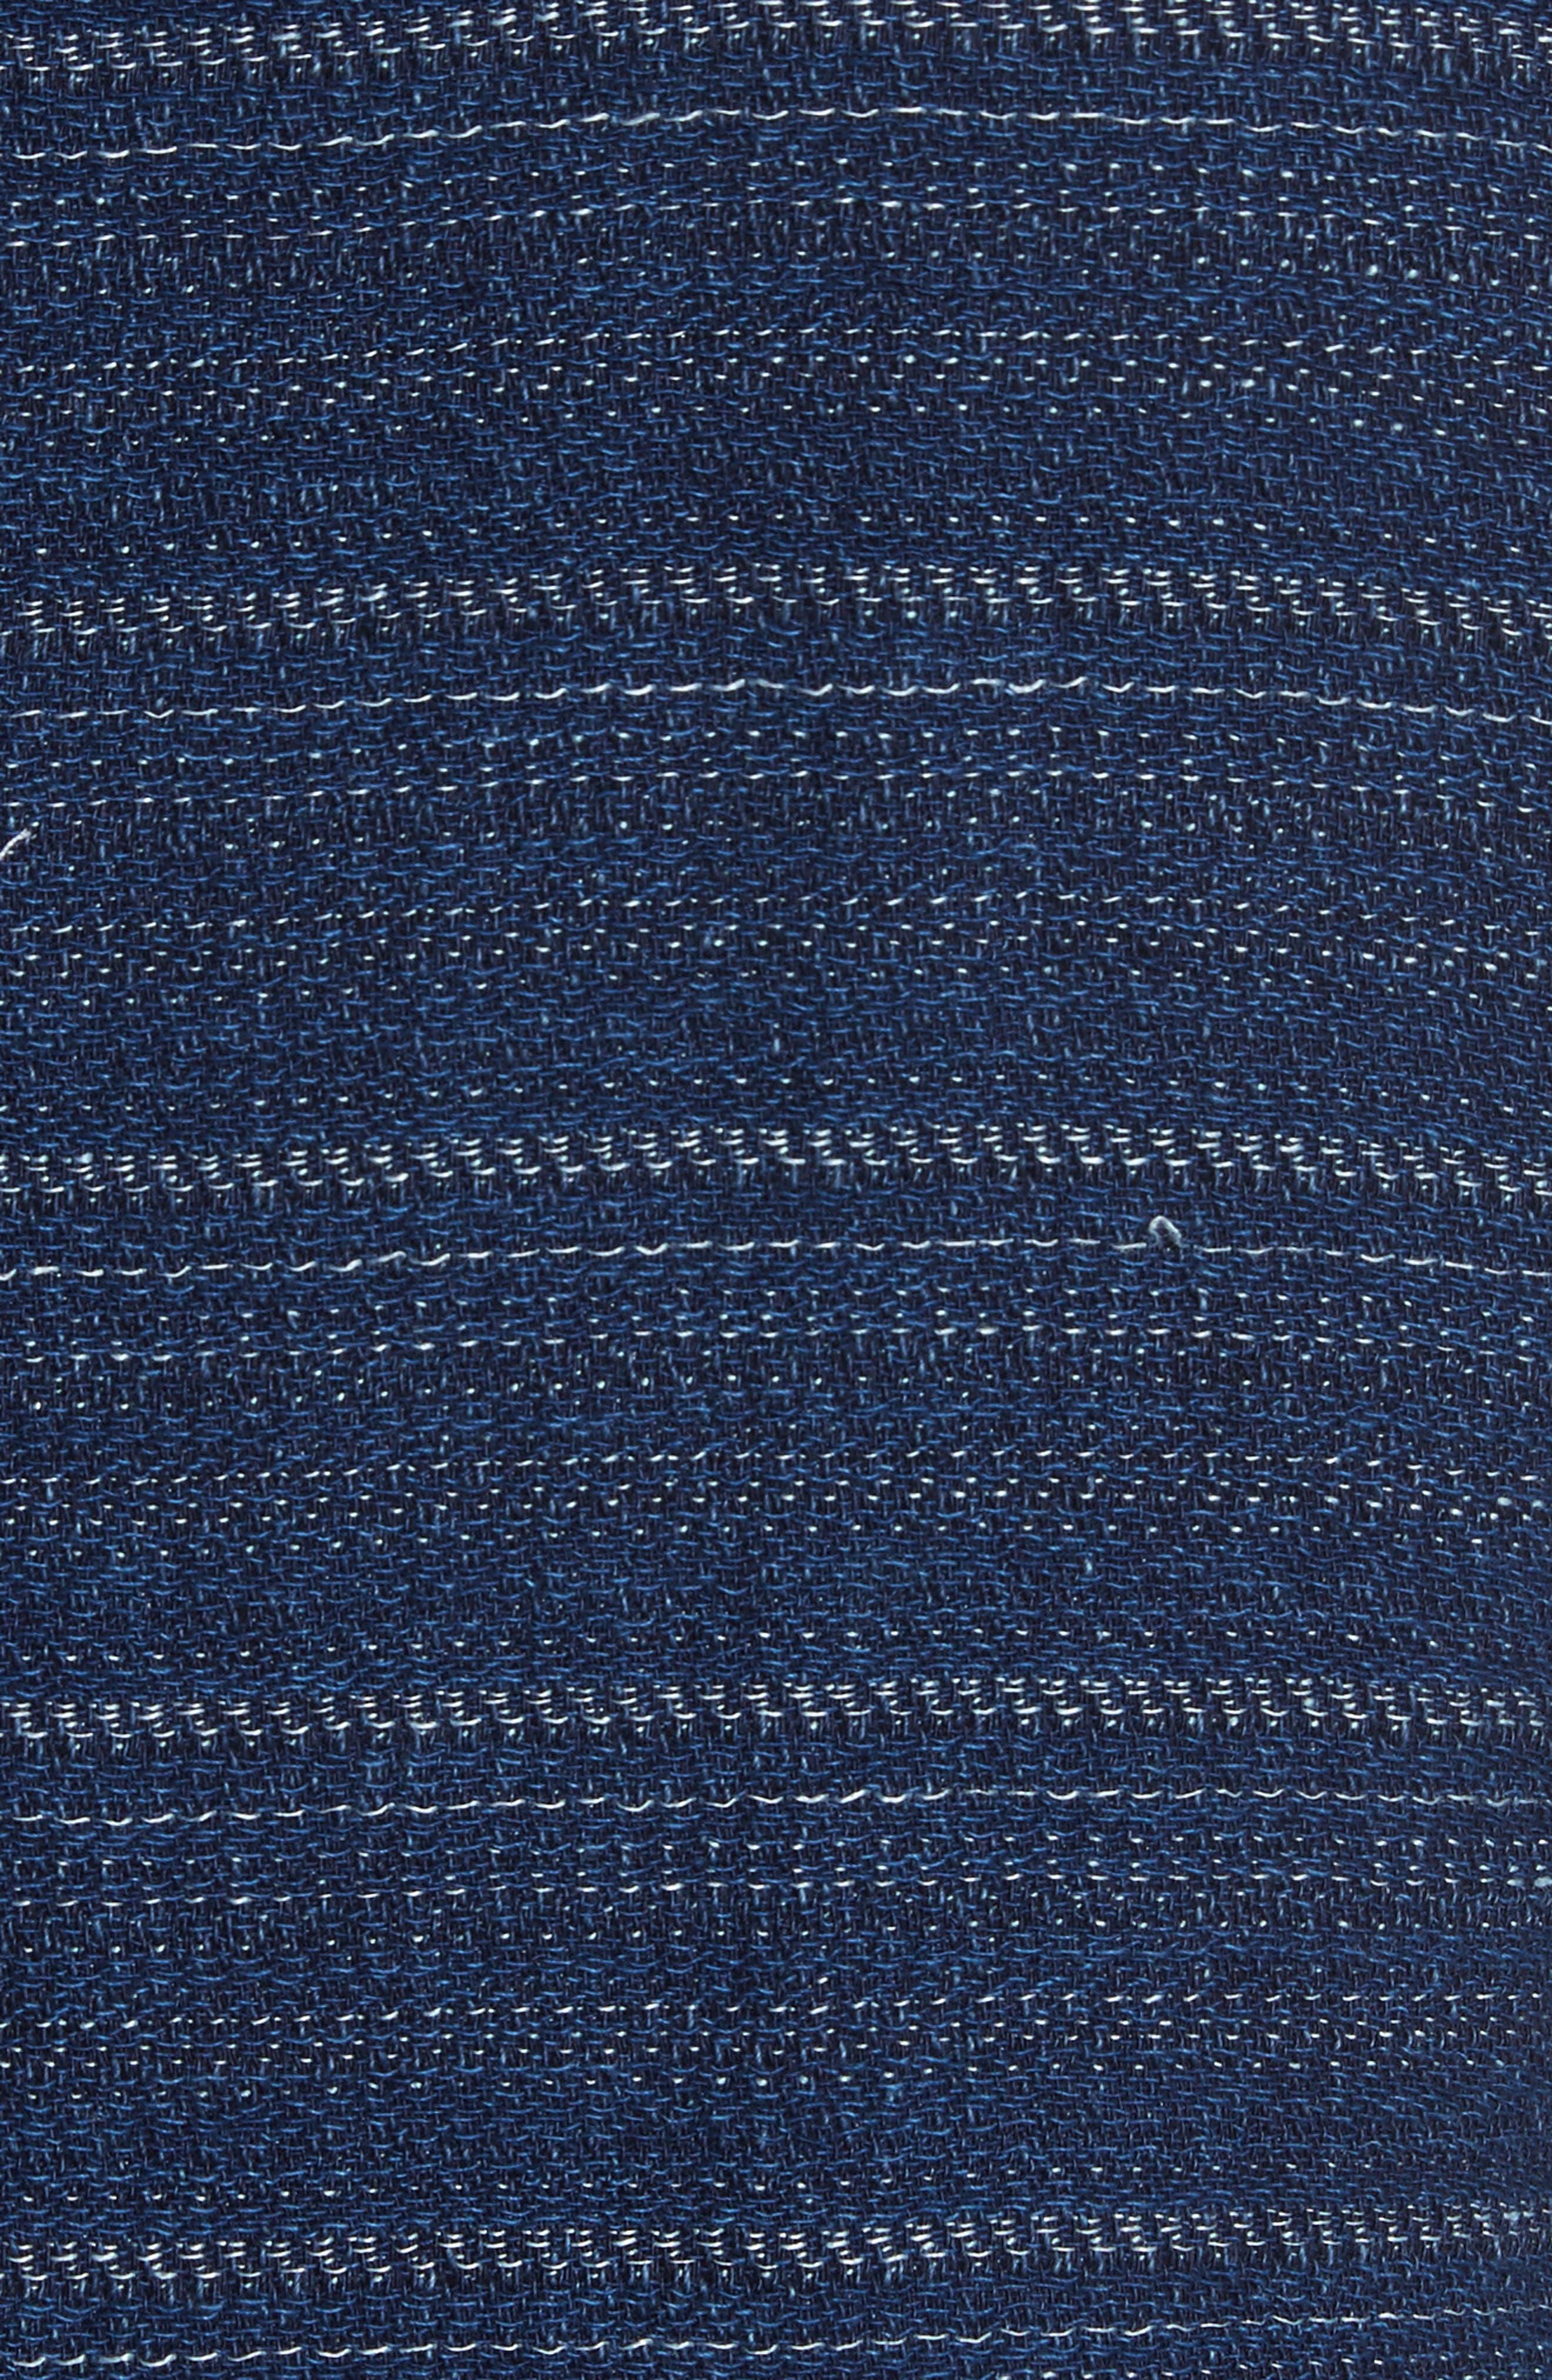 Napoli Nicola Barre Stripe Cotton & Linen Jacket,                             Alternate thumbnail 6, color,                             410